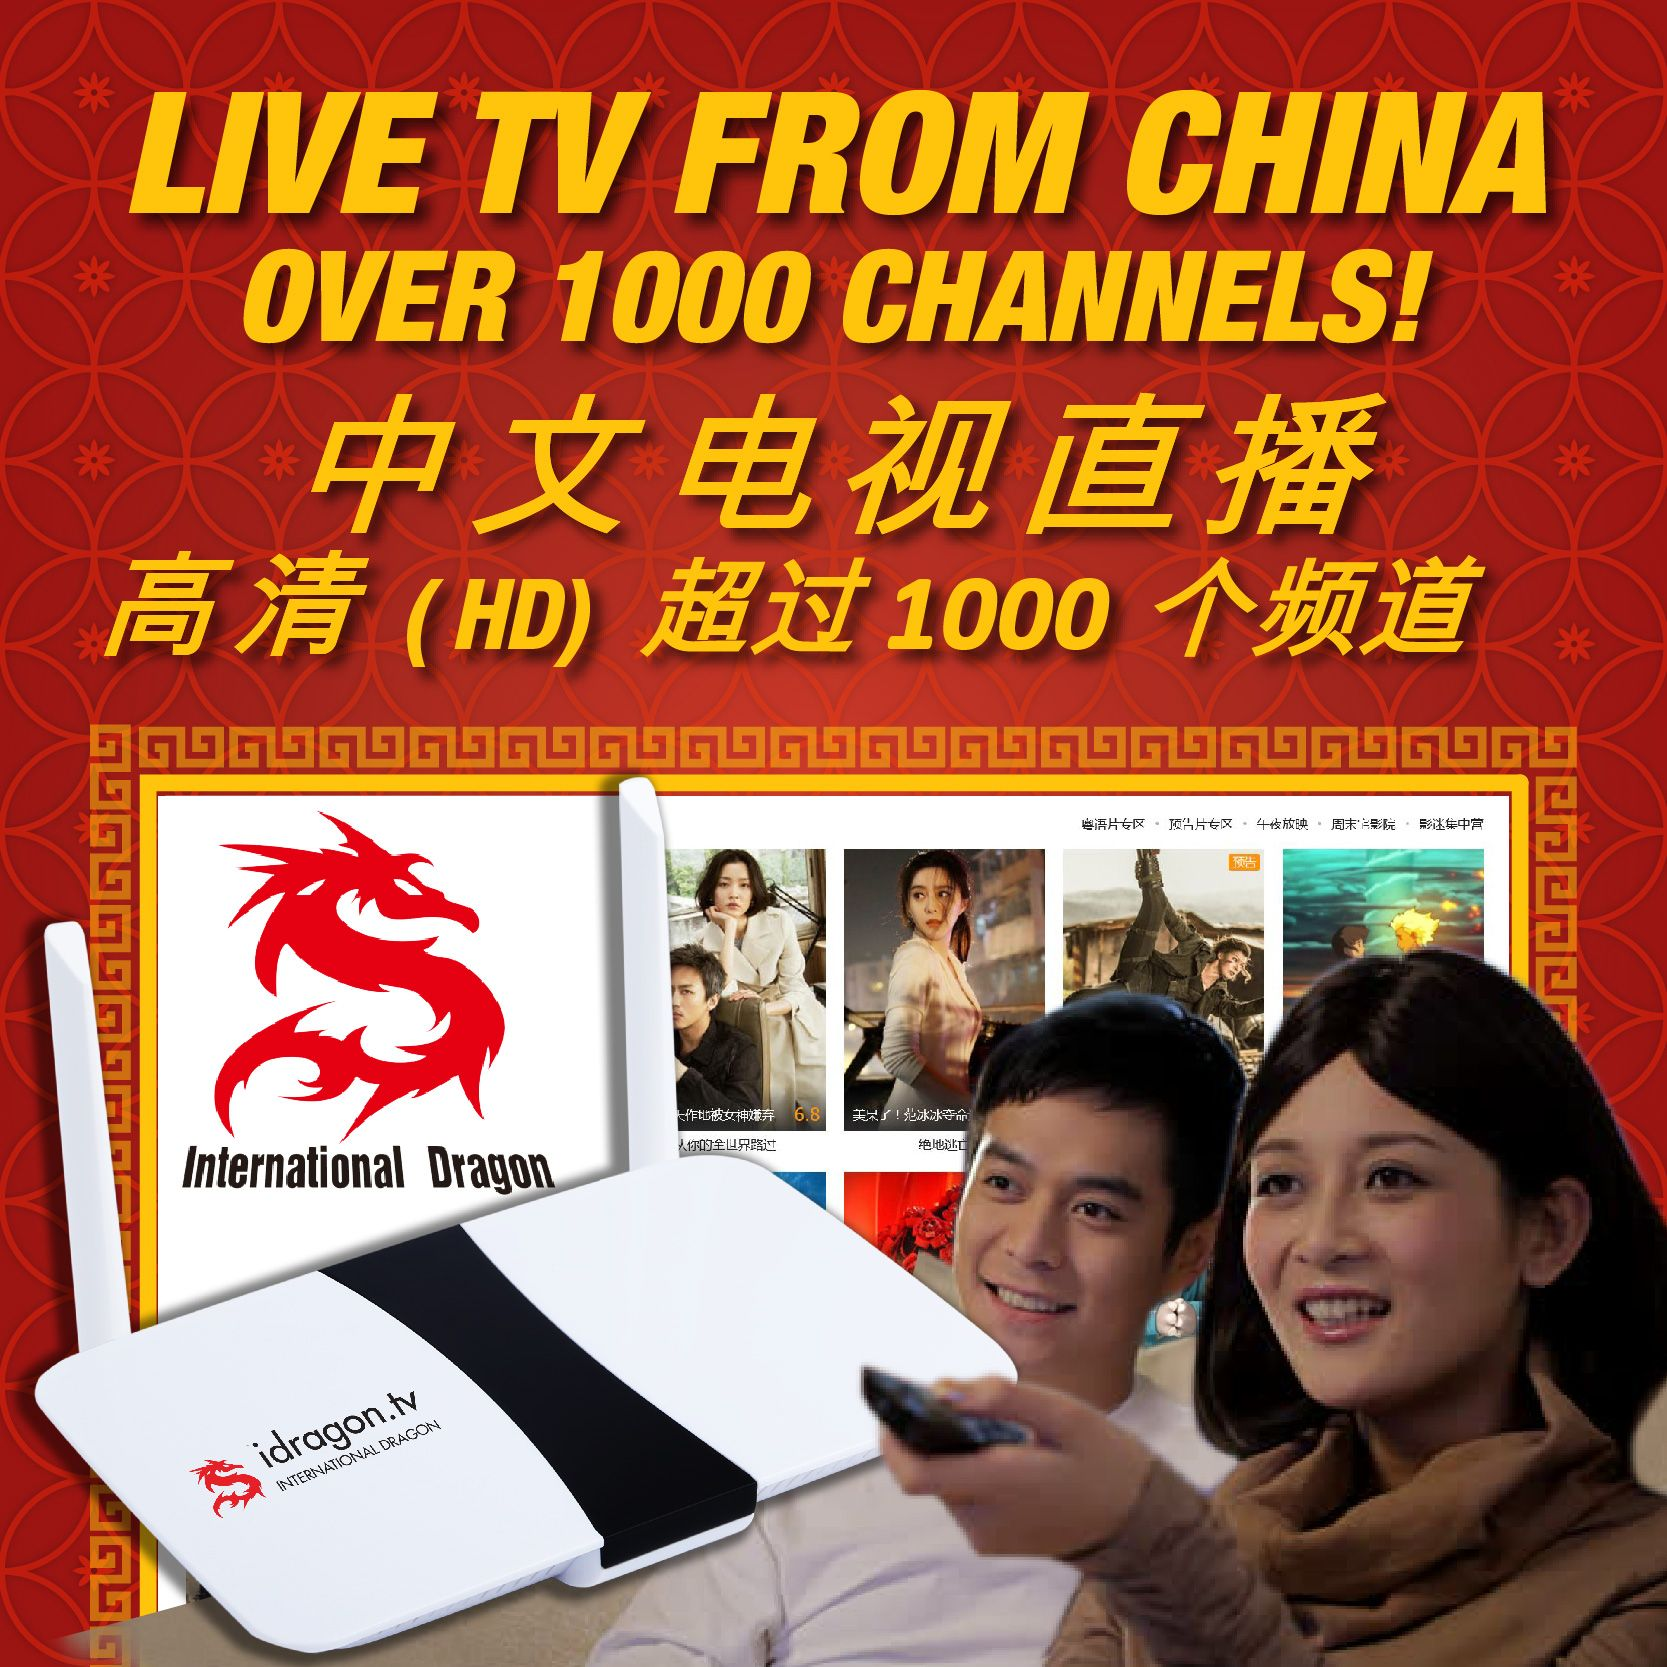 CHINESE LIVE IPTV STREAMING BOX - iDRAGON | Live TV Box